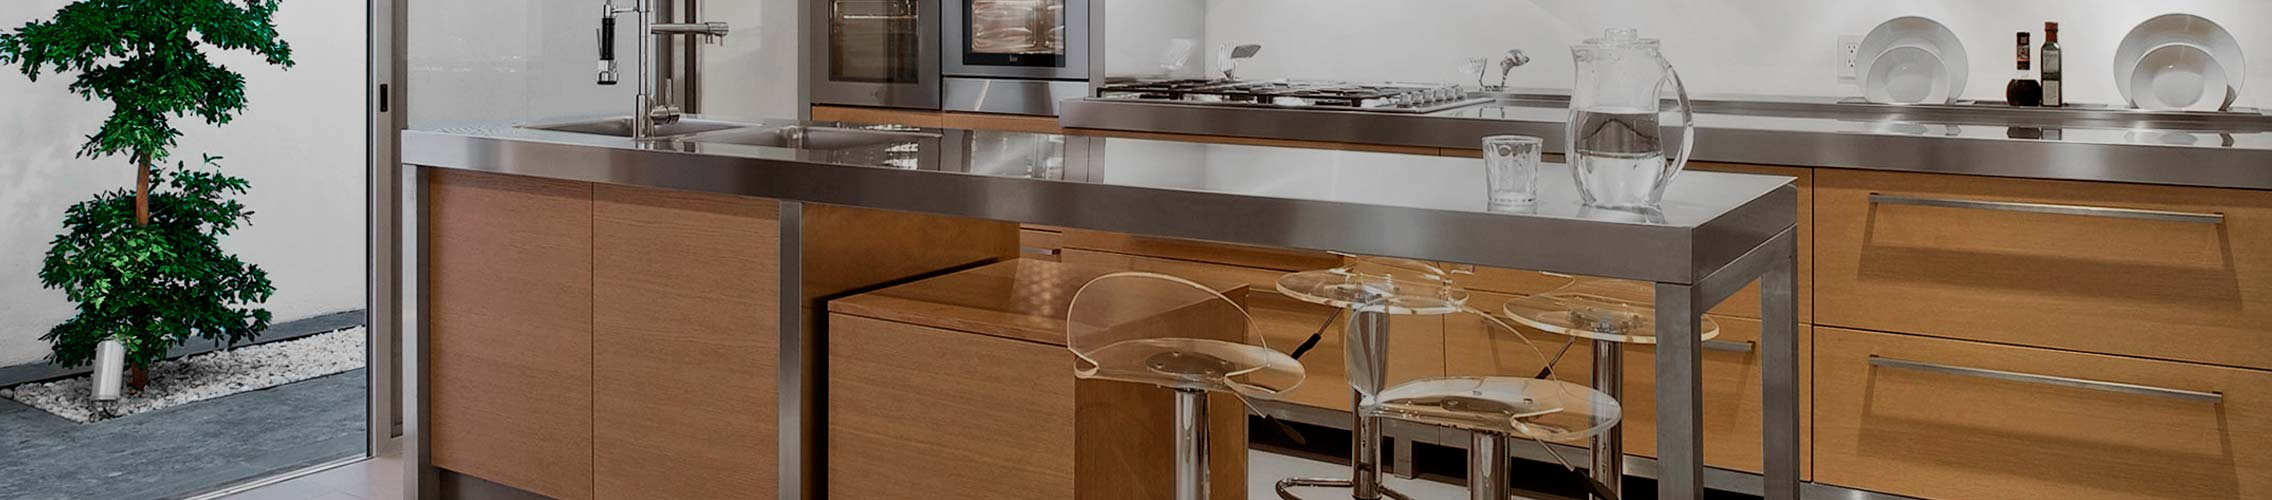 Acrylic Kitchen Stools Atlantic Shopping